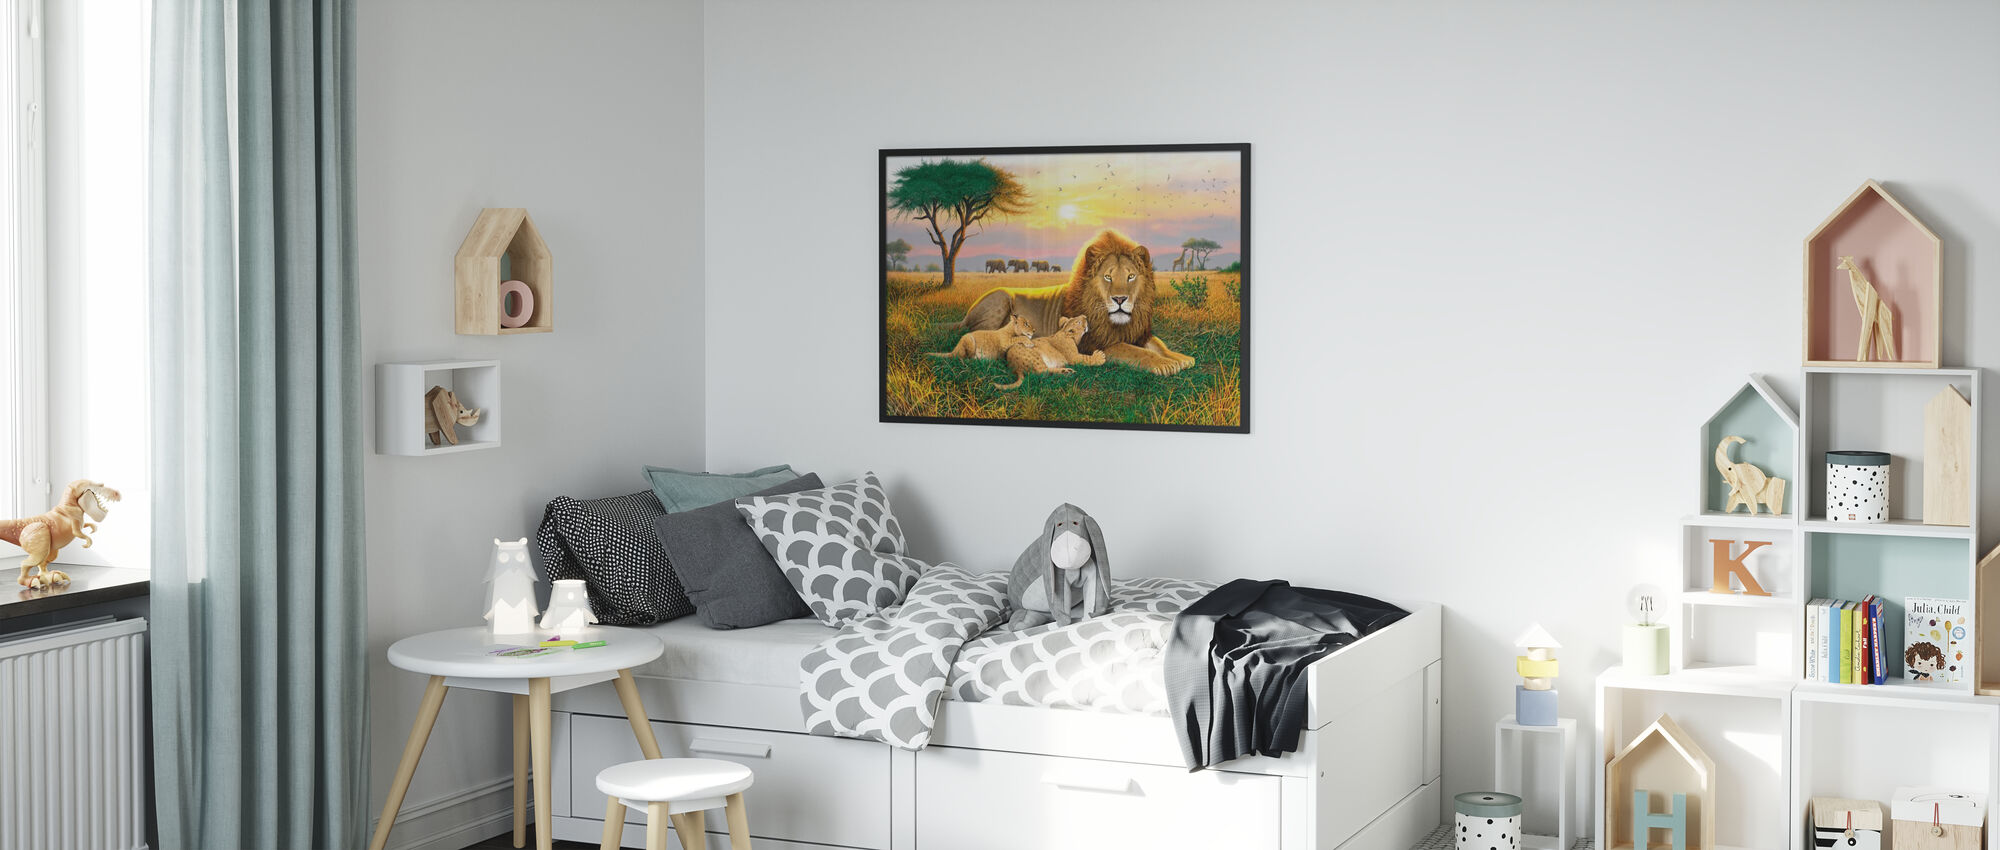 Kings of the Serengeti - Poster - Kids Room